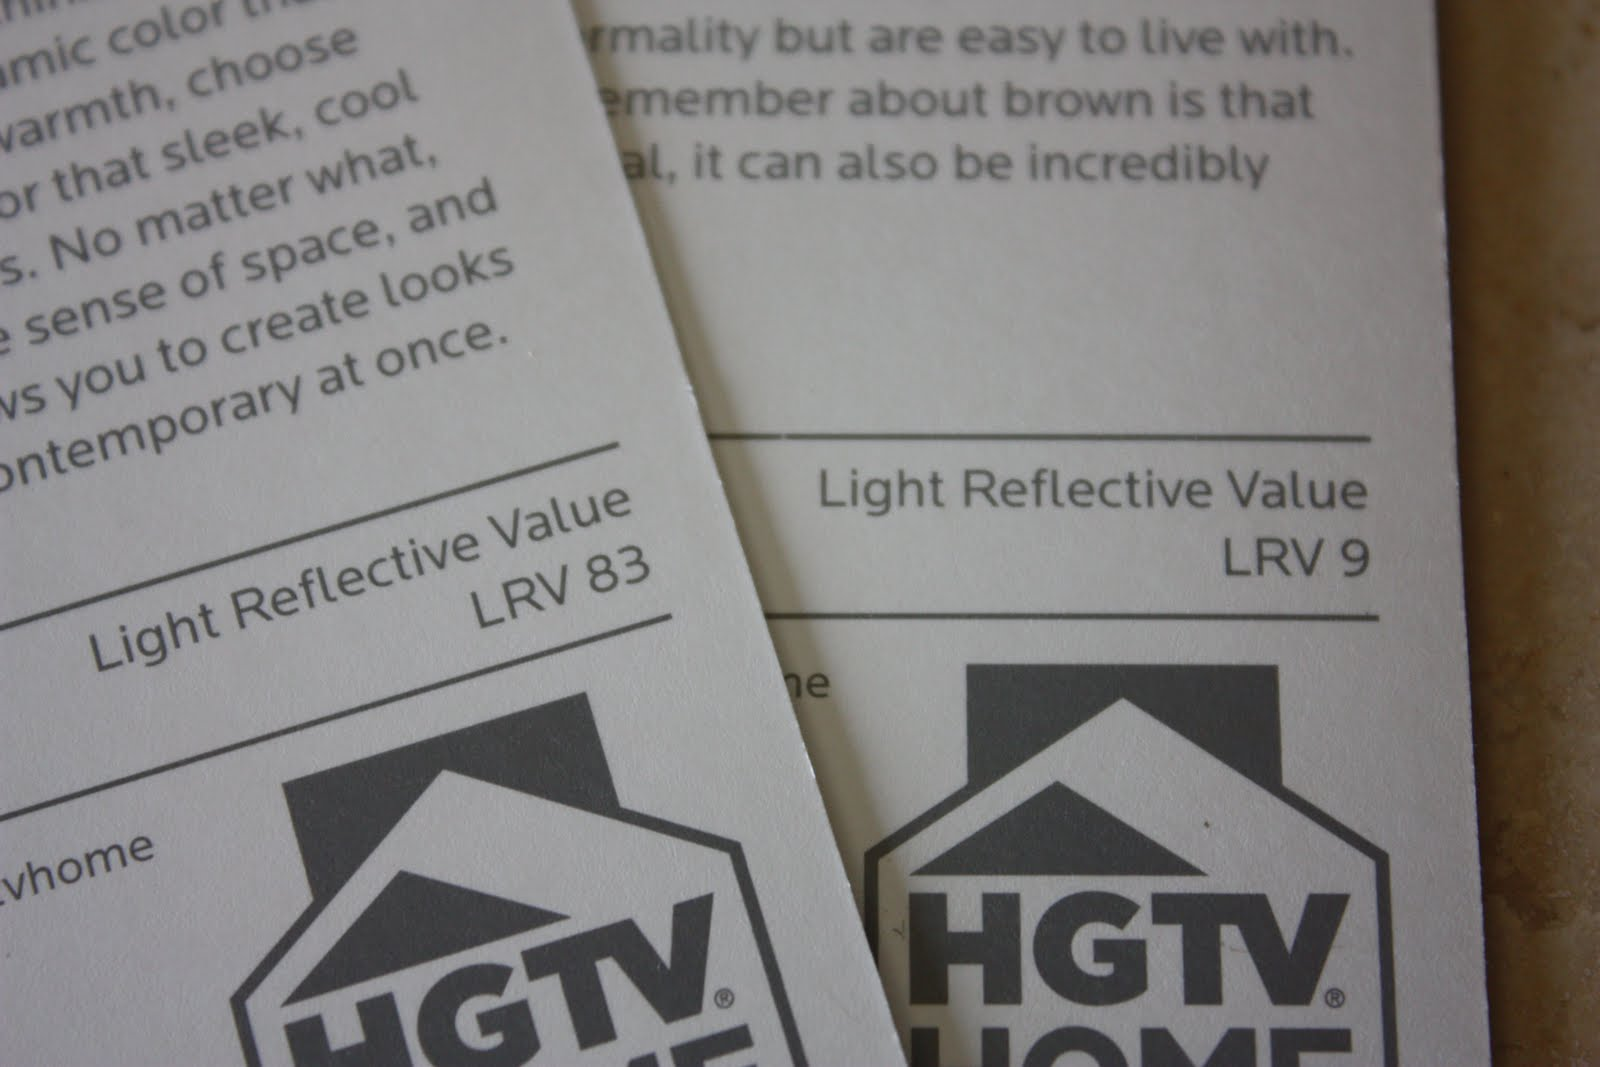 Light Reflectance Value